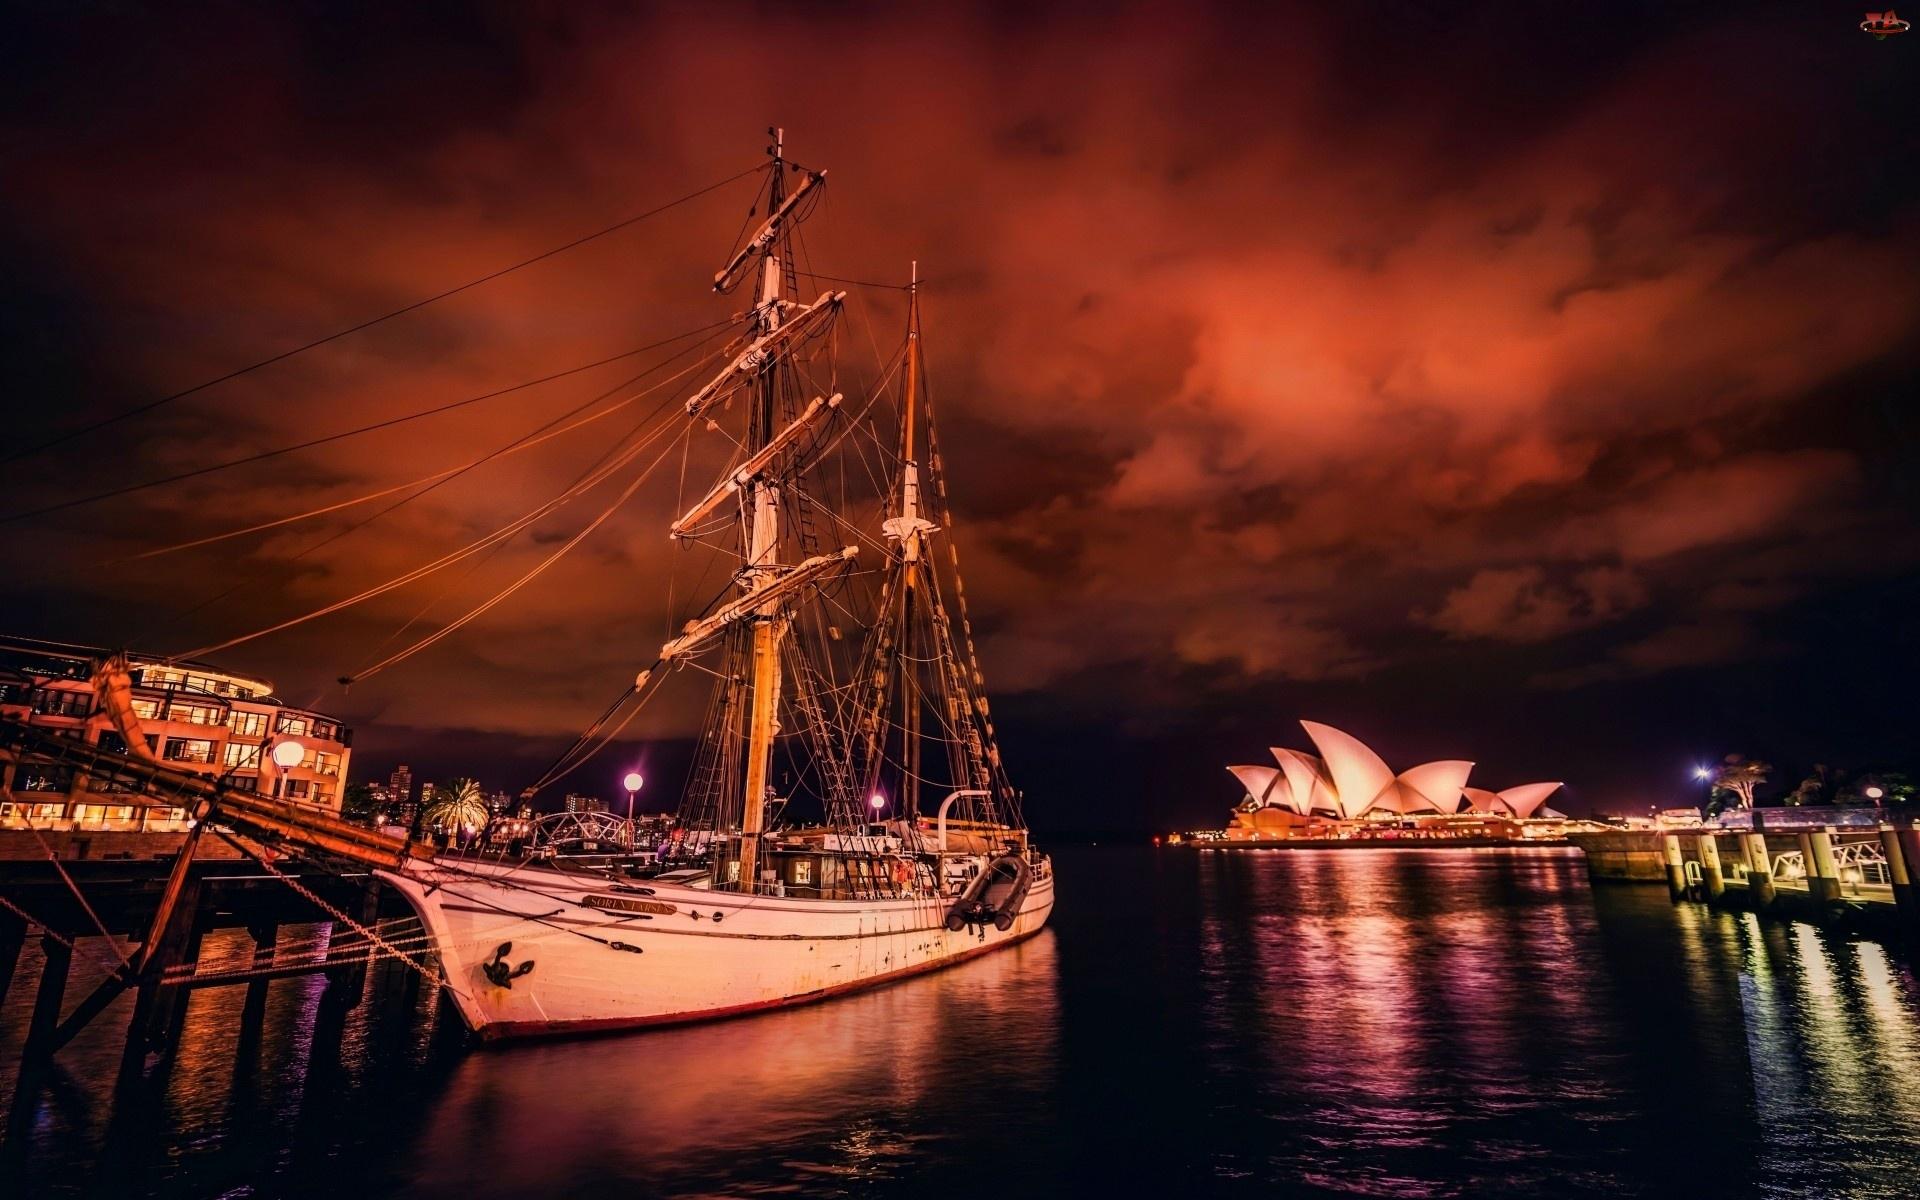 Żaglowiec, Noc, Opera, Sydney